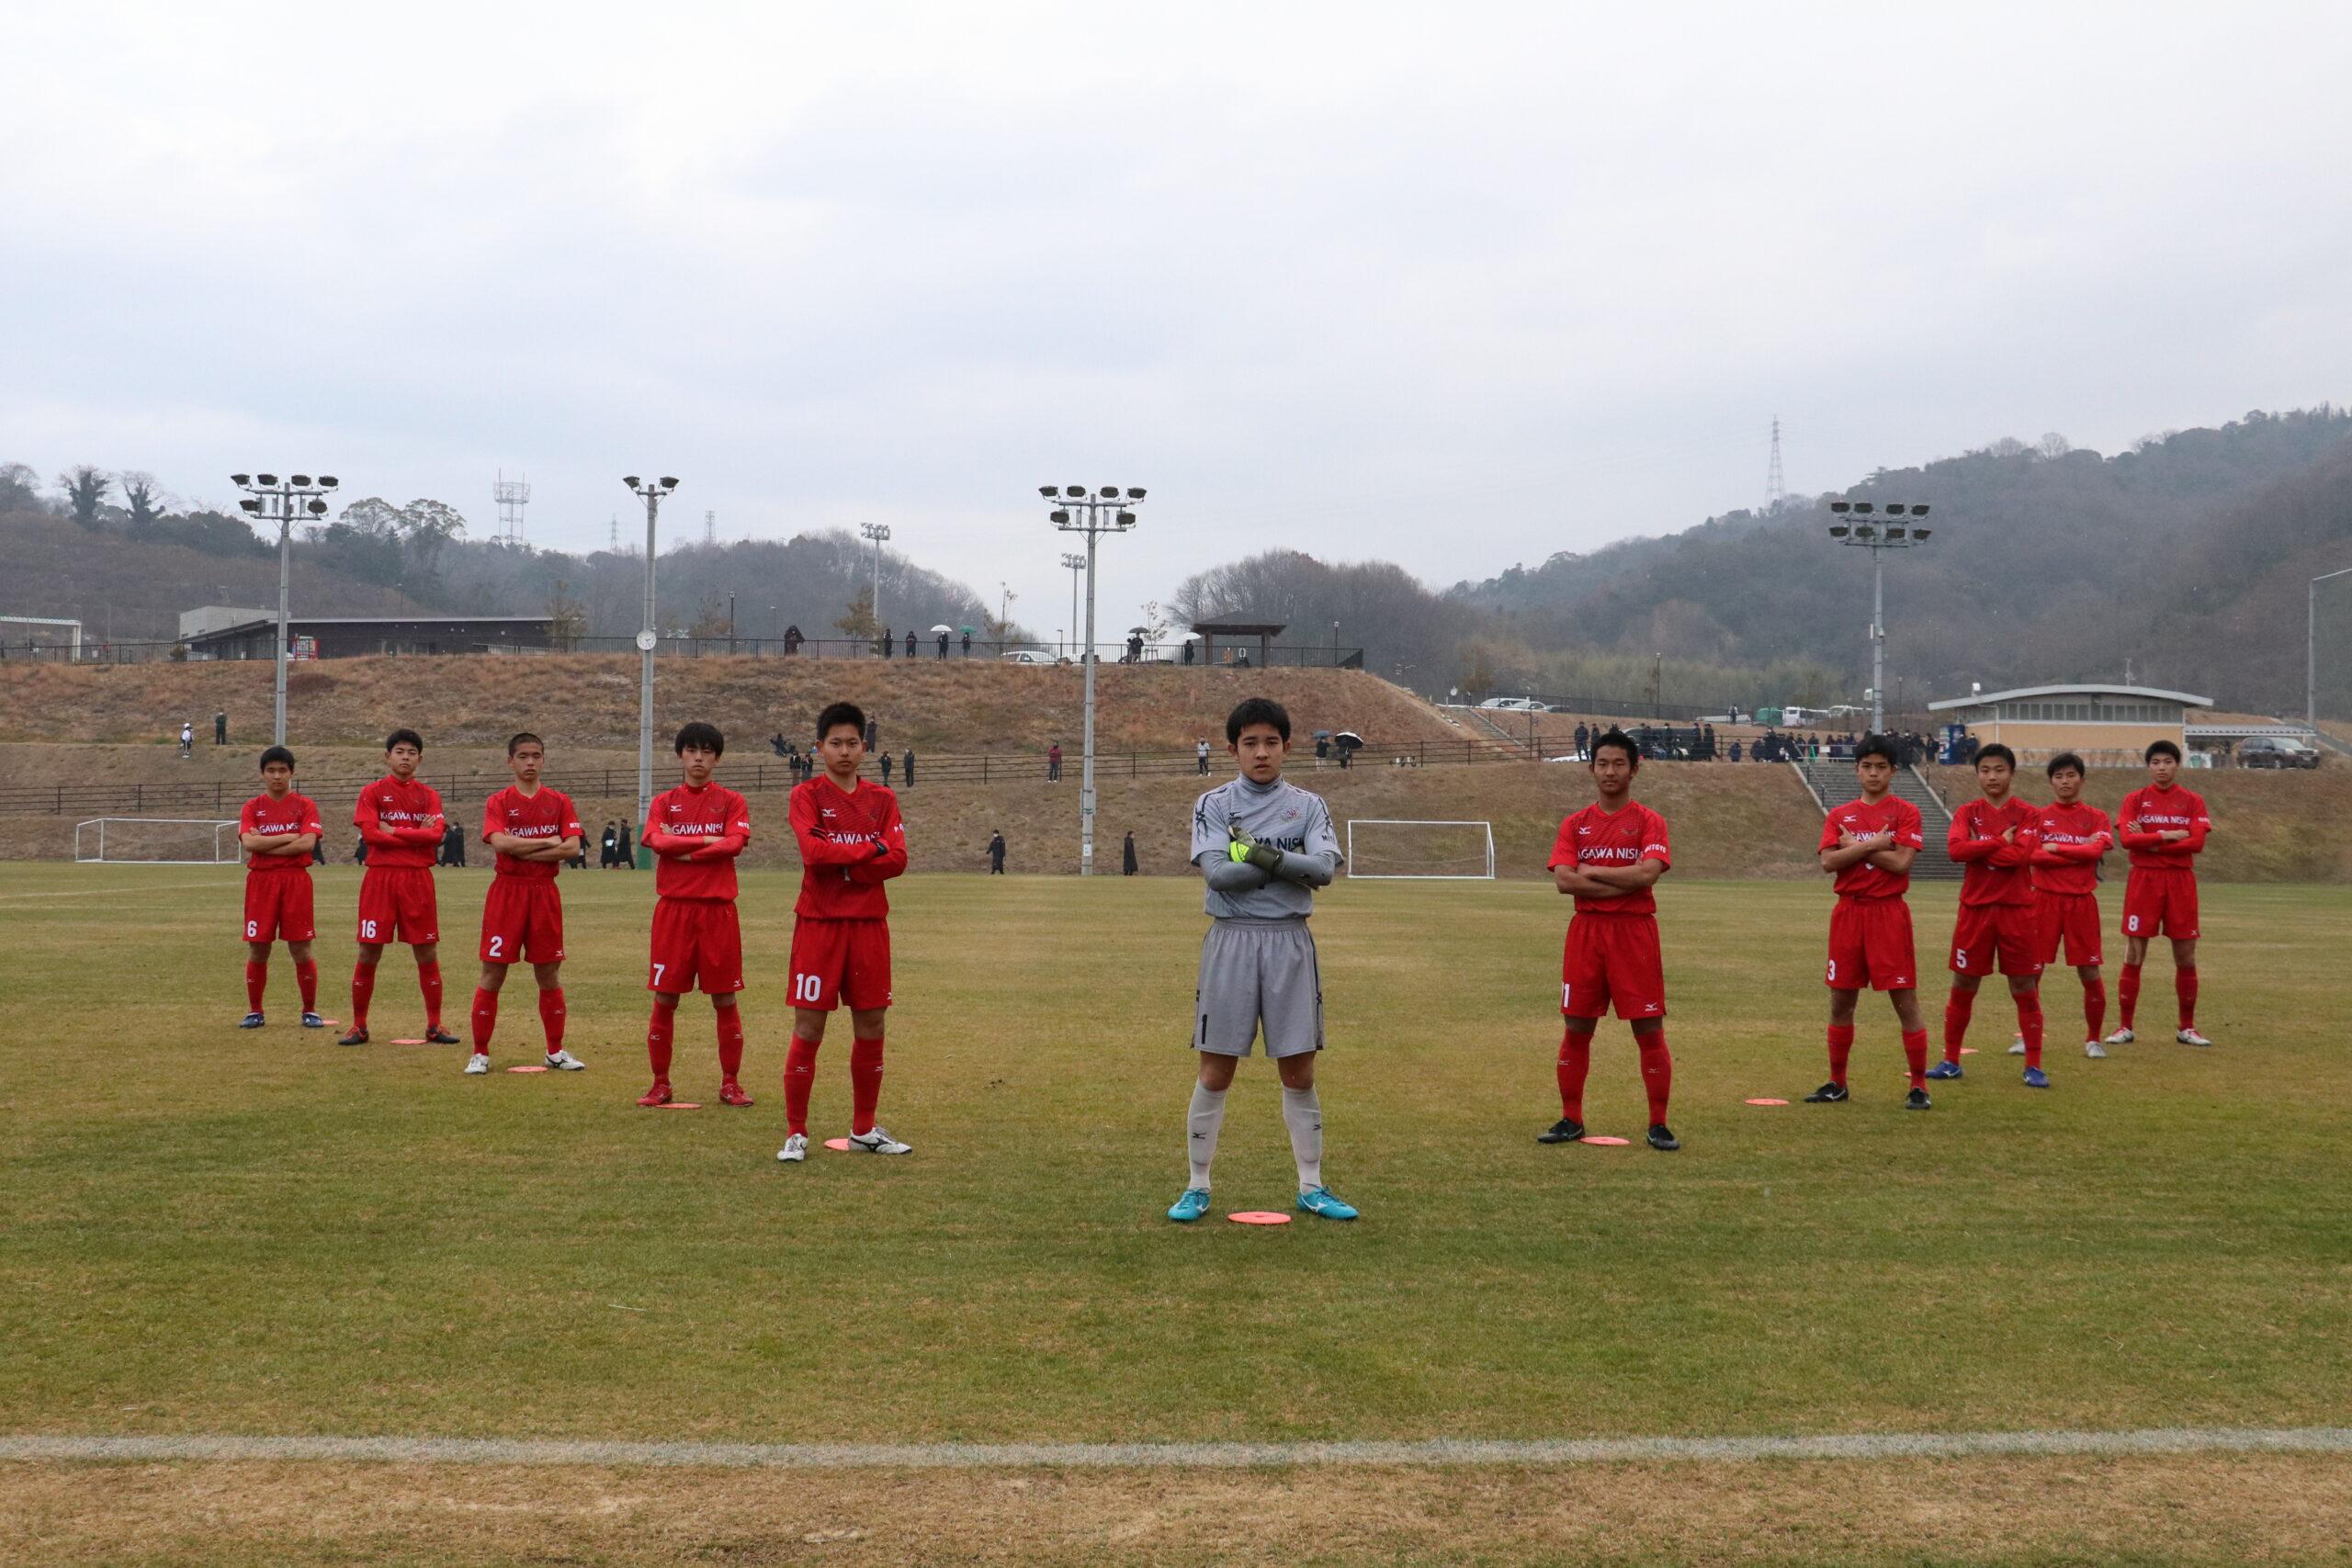 令和2年度香川県高等学校新人大会 サッカー競技